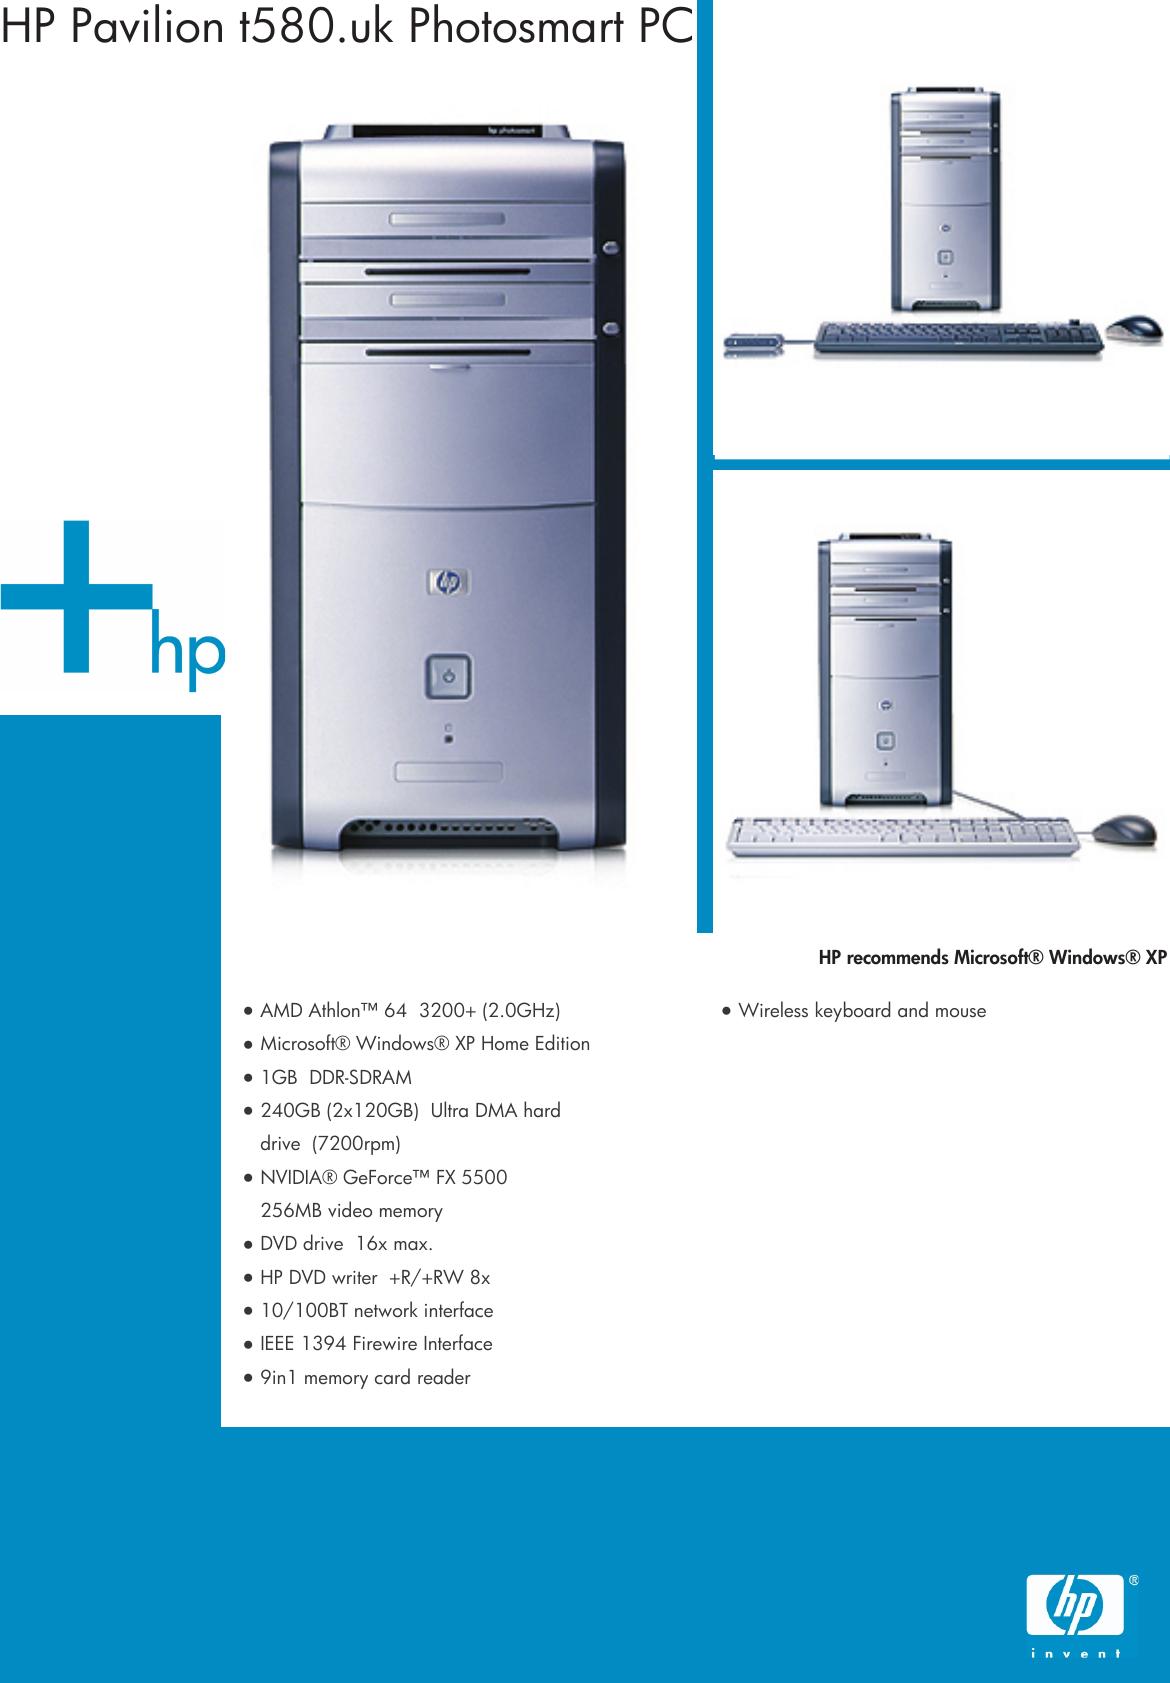 HP Summer Desktop Datasheet Pavilion PC T580 dk Product